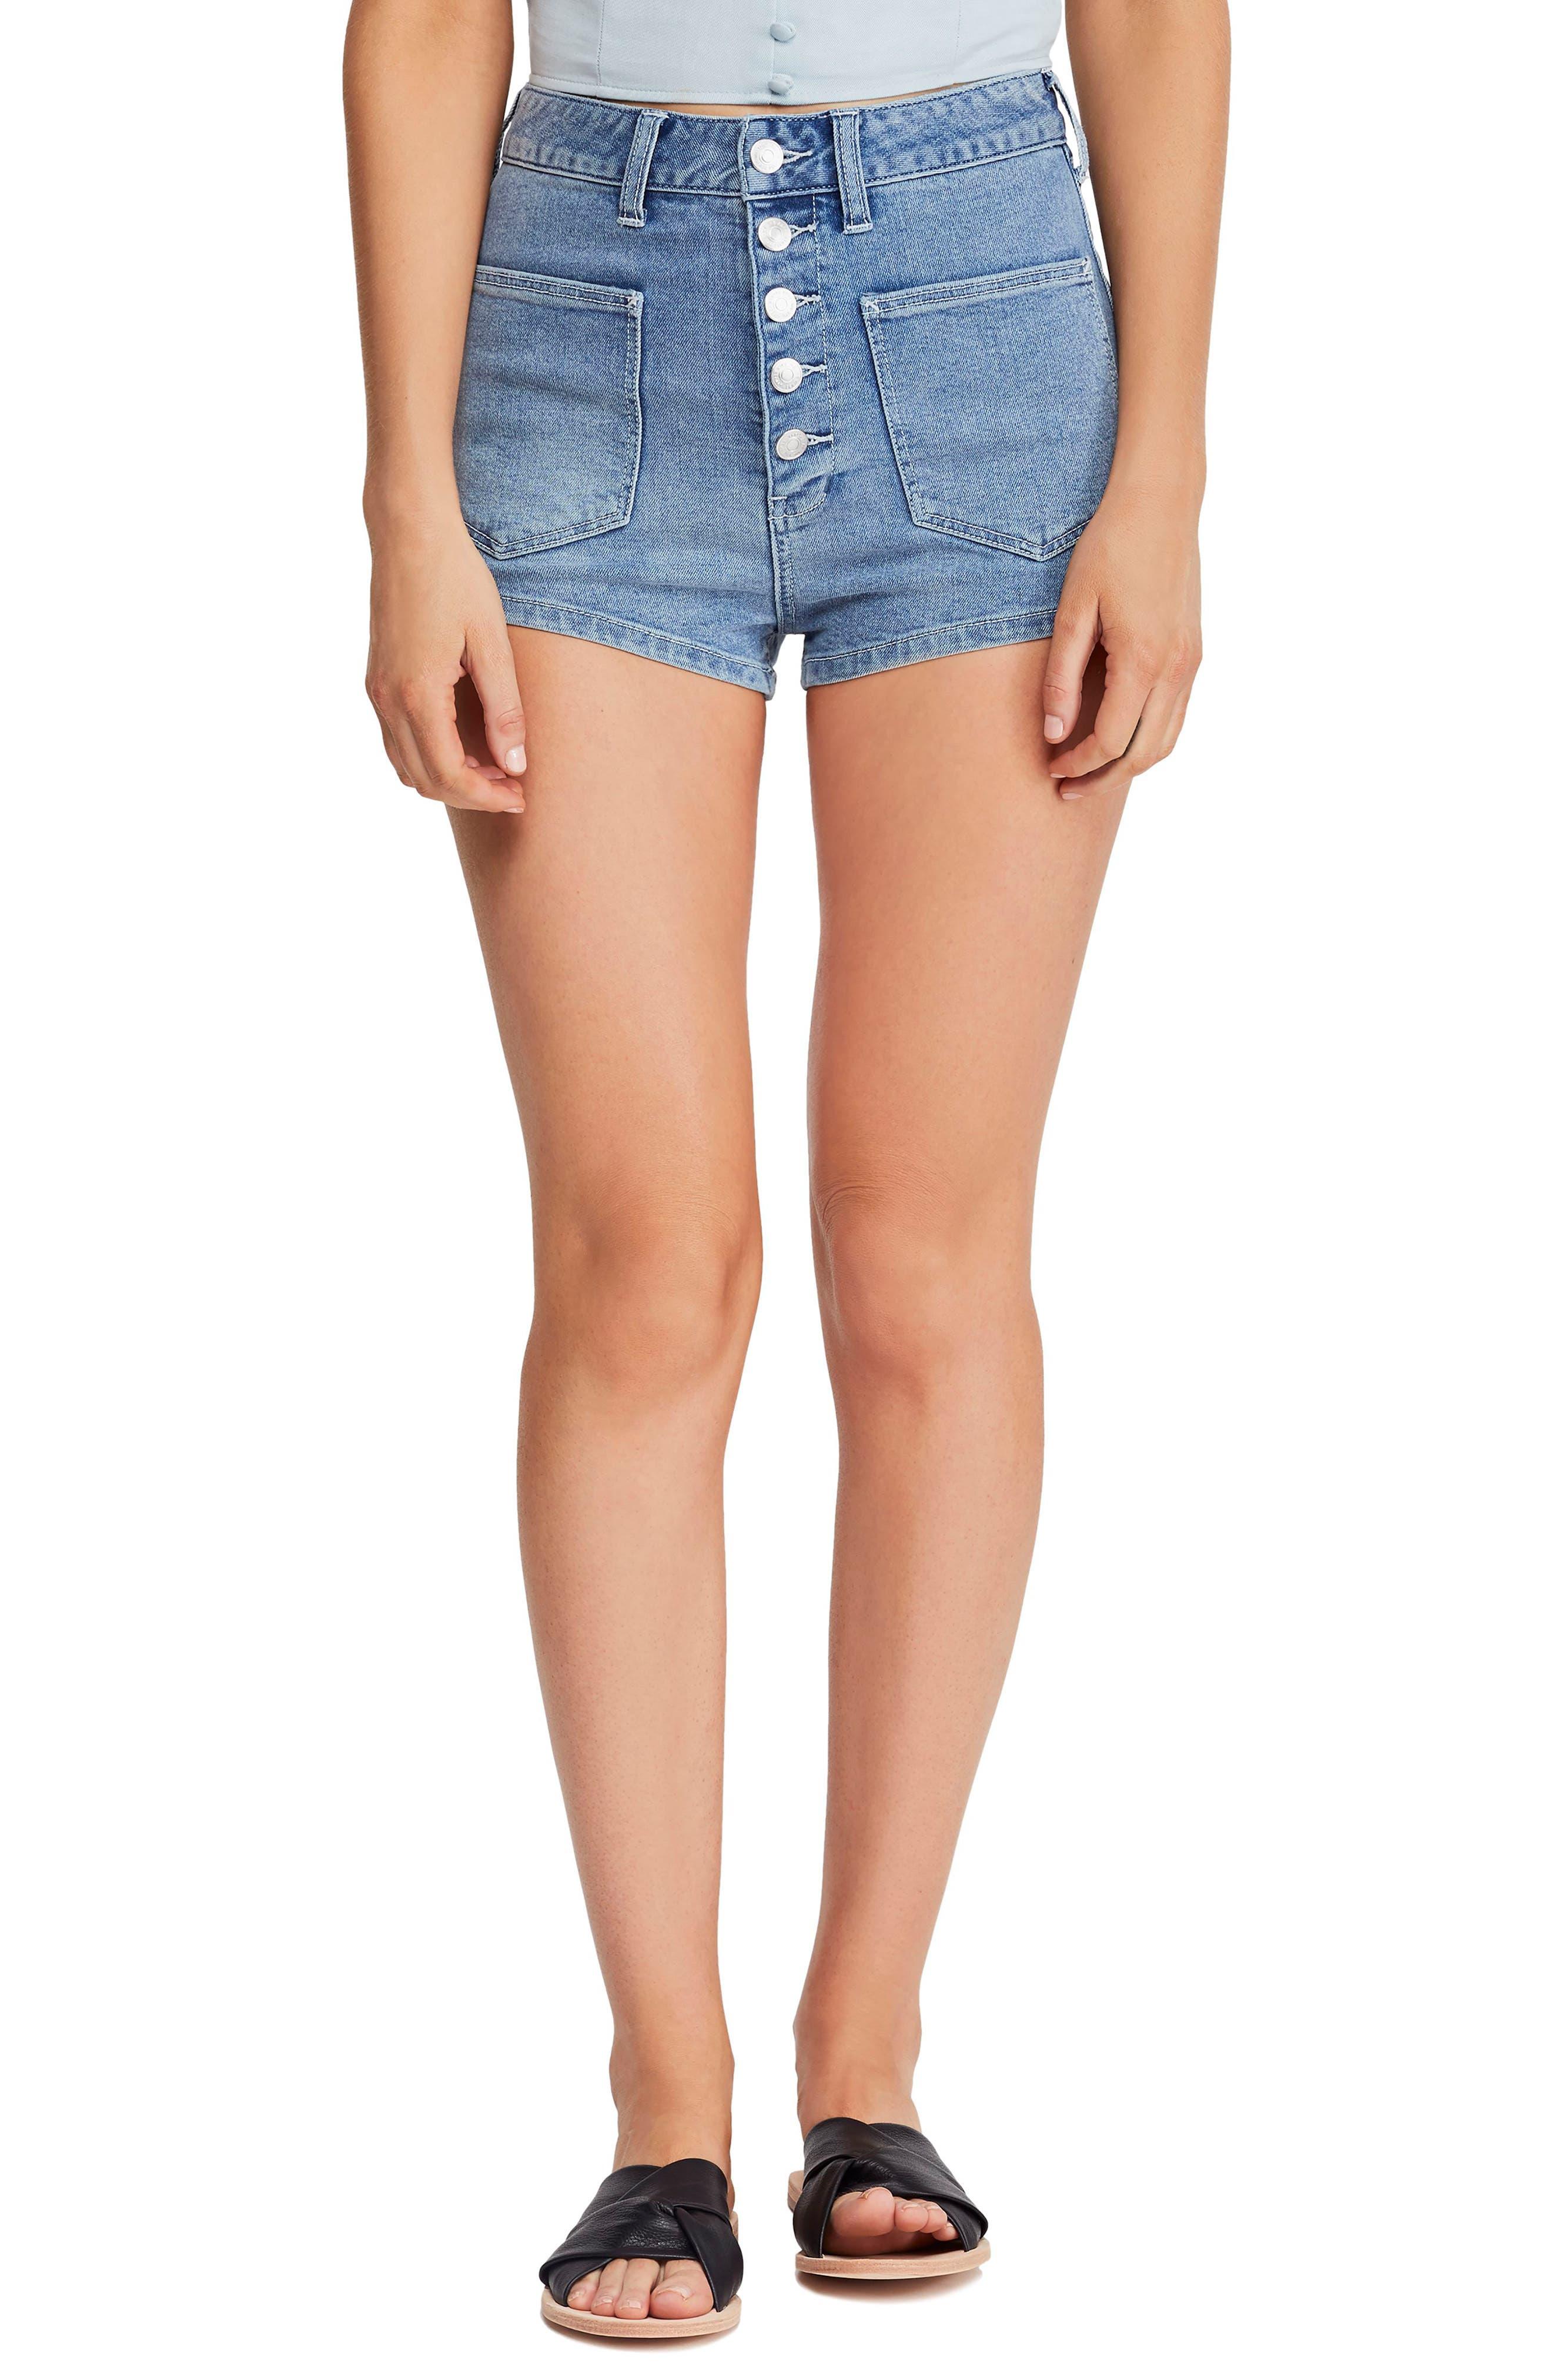 Vintage High Waisted Shorts, Sailor Shorts, Capris Womens Free People Bridgette Denim Shorts $68.00 AT vintagedancer.com